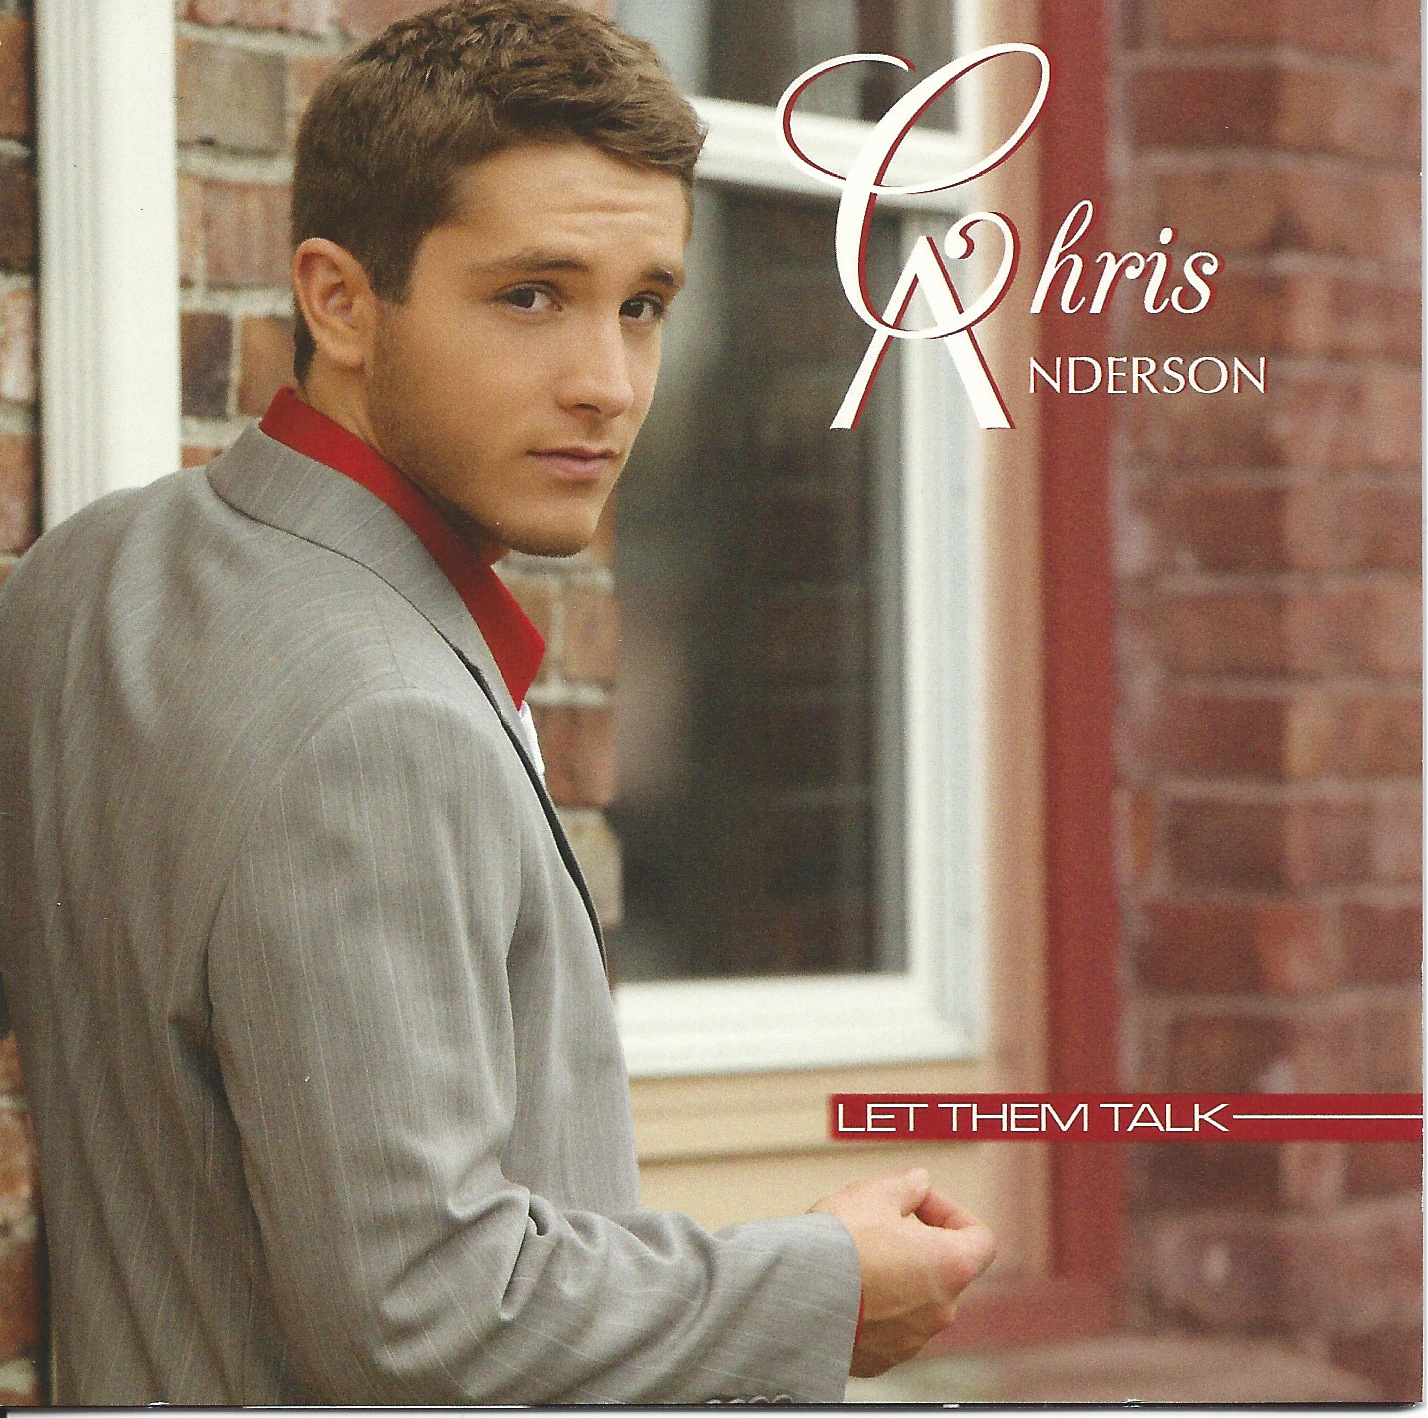 chris andersons, let them talk, album, singer, entertainer